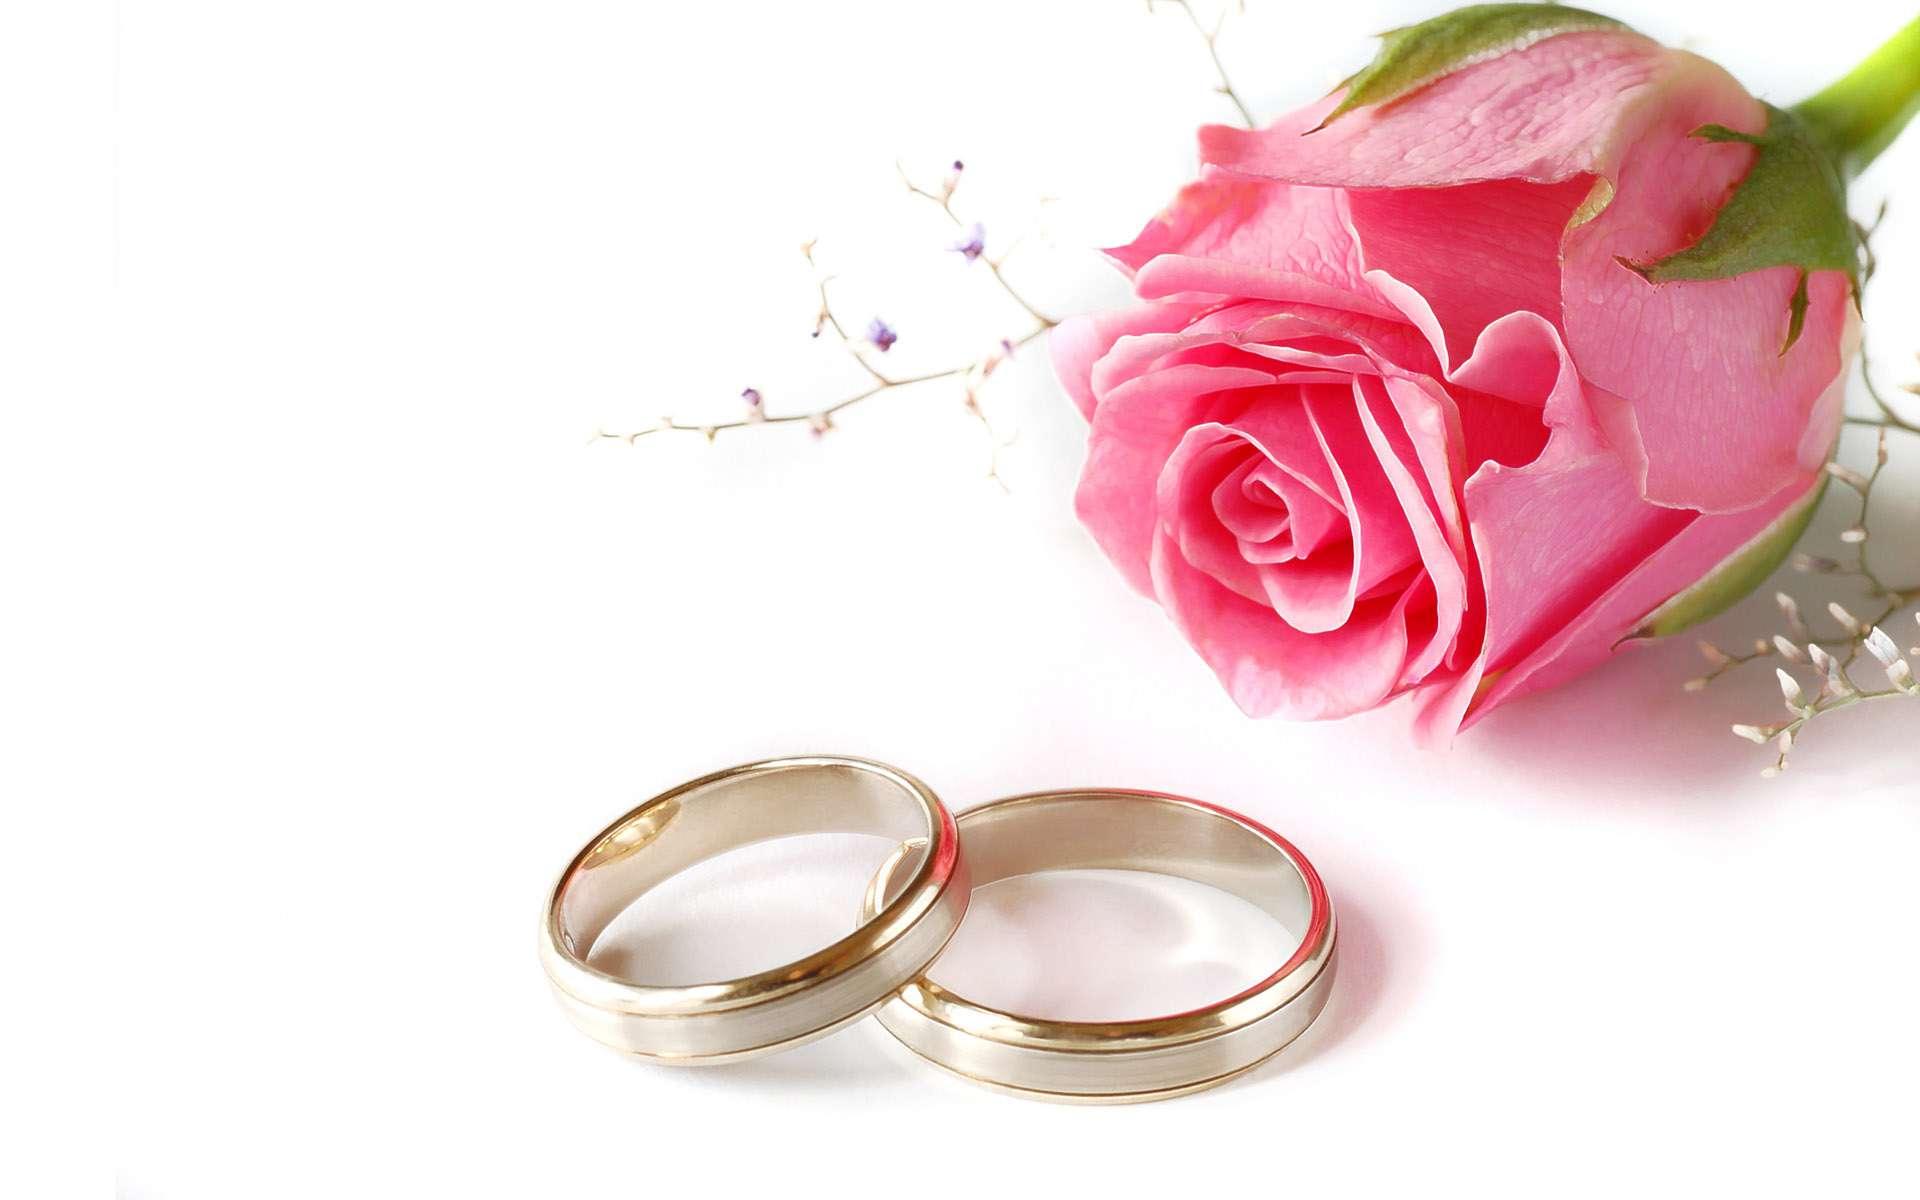 wedding background images - Akba.greenw.co